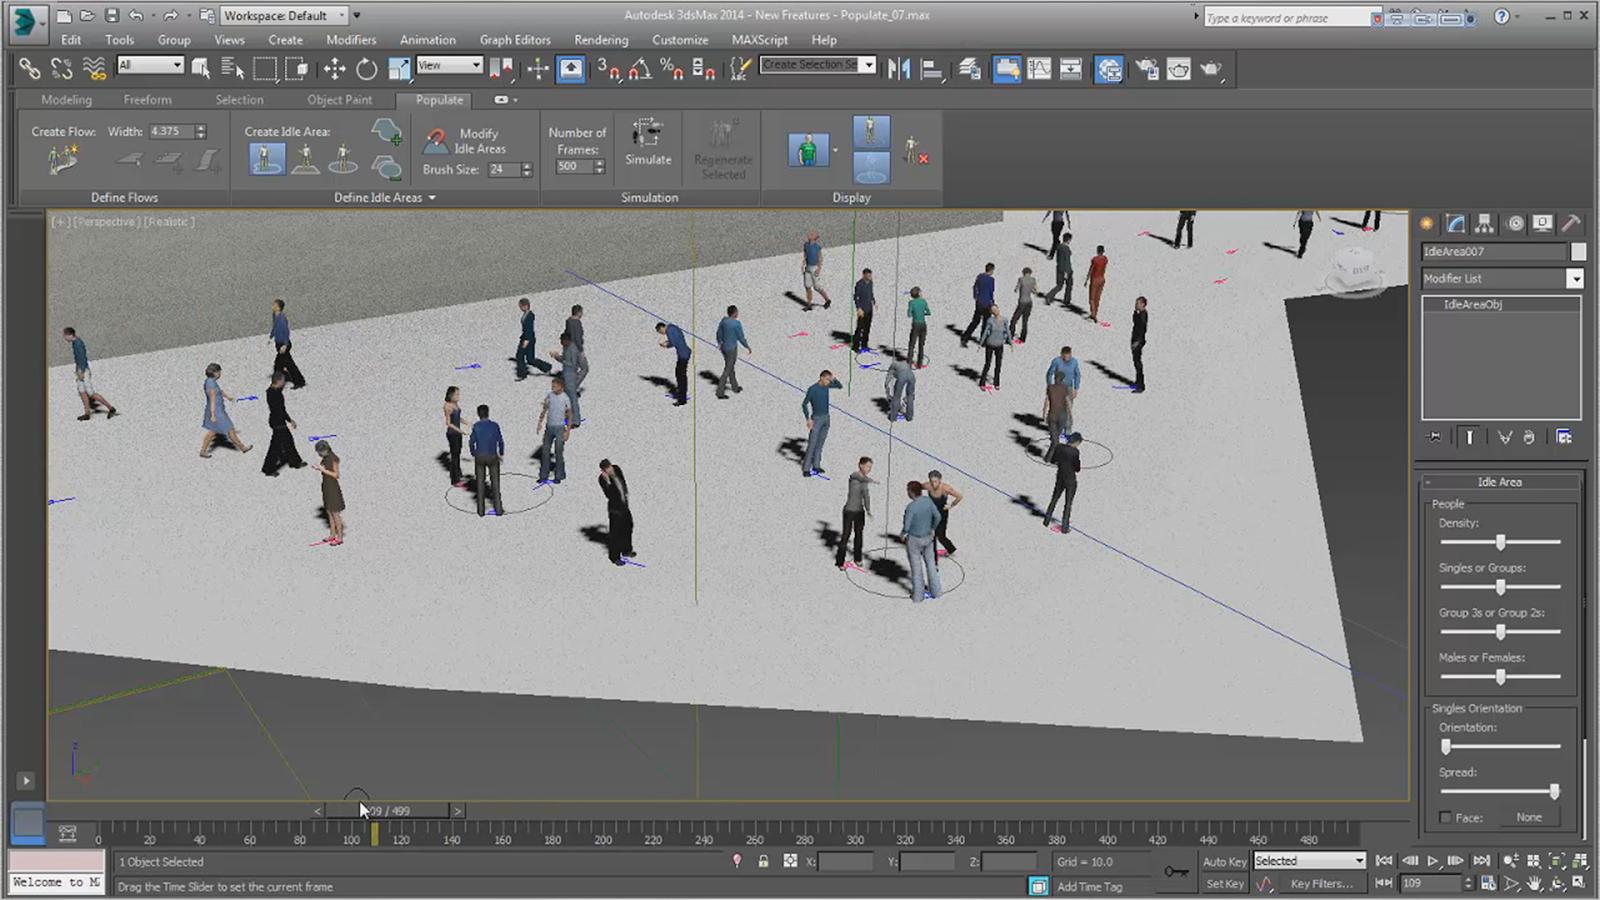 Autodesk 3ds max design 2014 Download